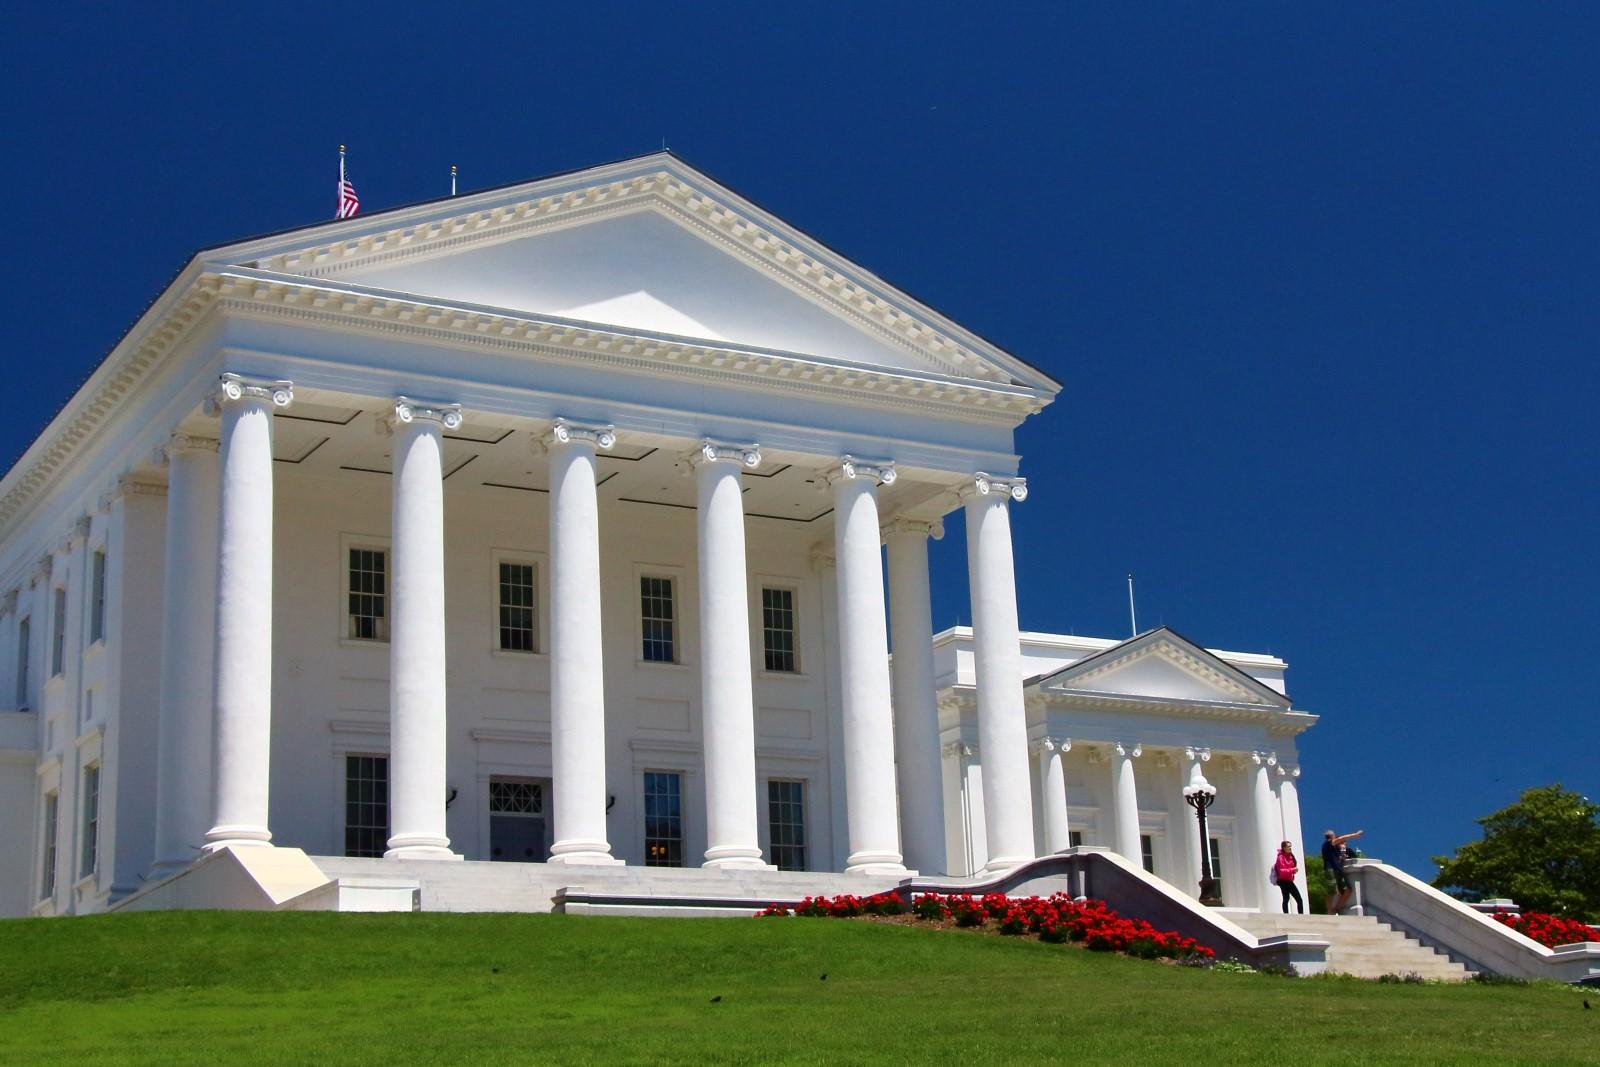 hany.info - Richmond hlavní město státu Virginie e38f292b5b